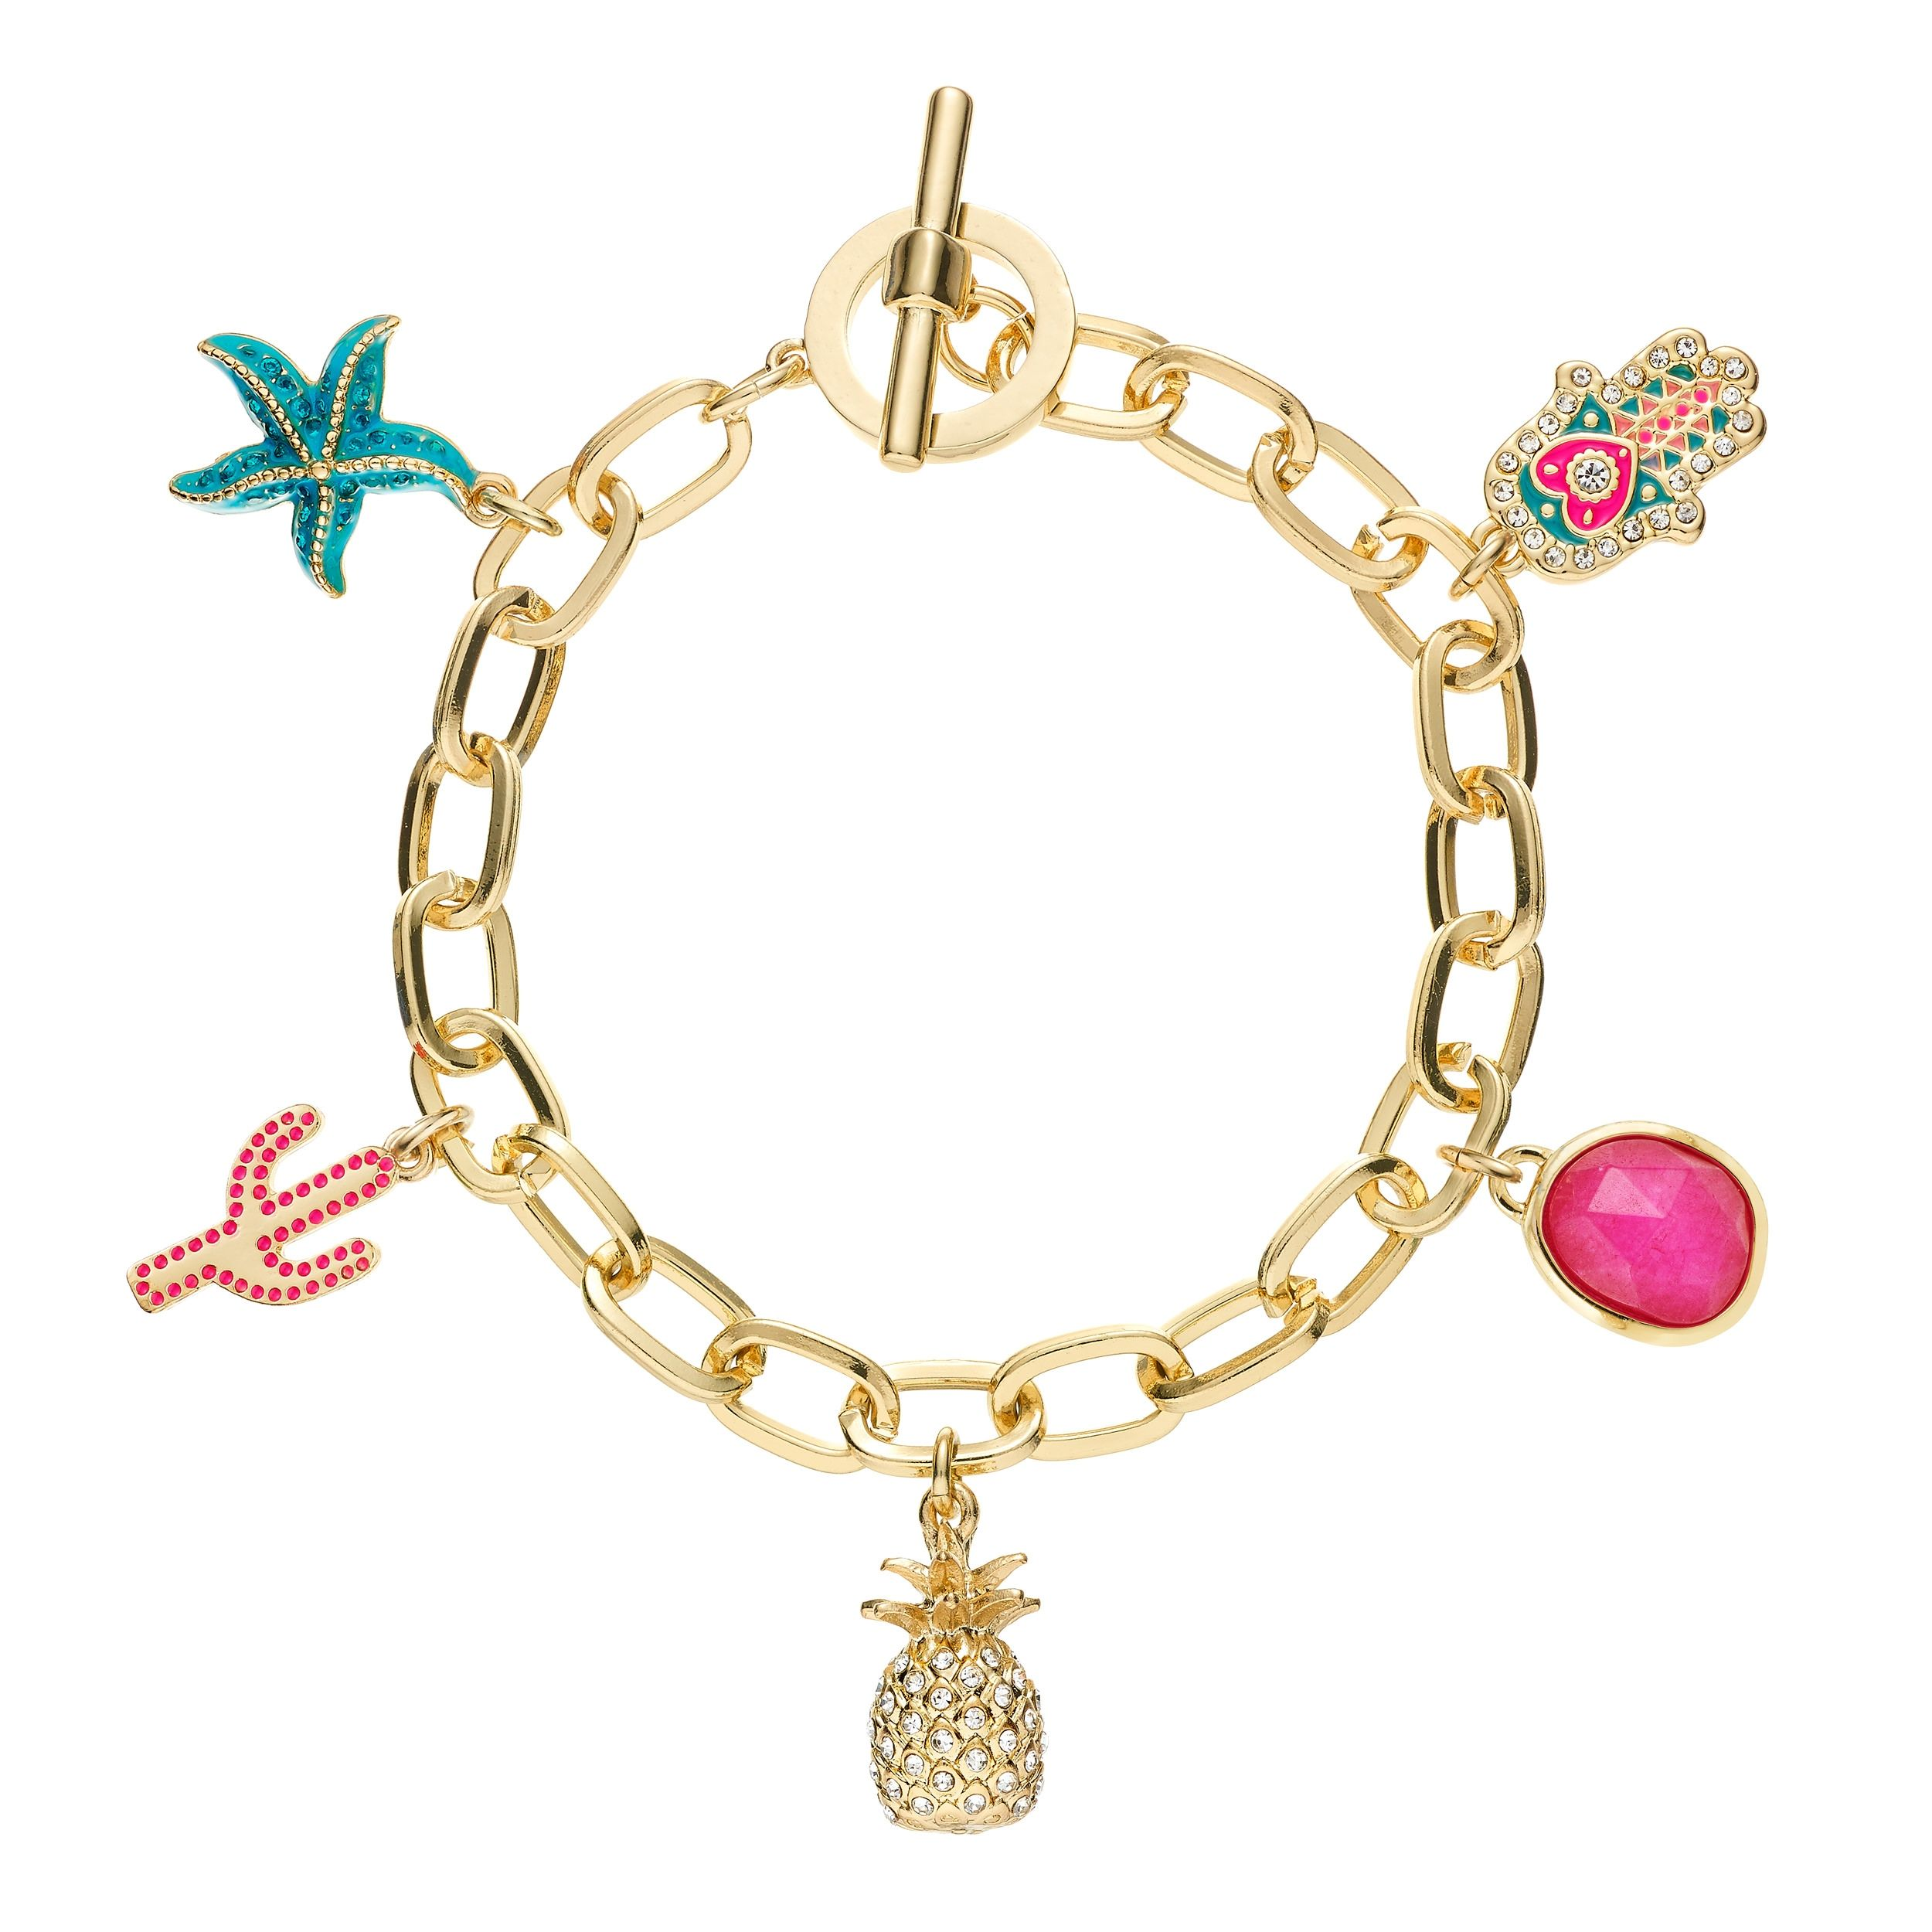 Buckley London Paradise Charm Bracelet